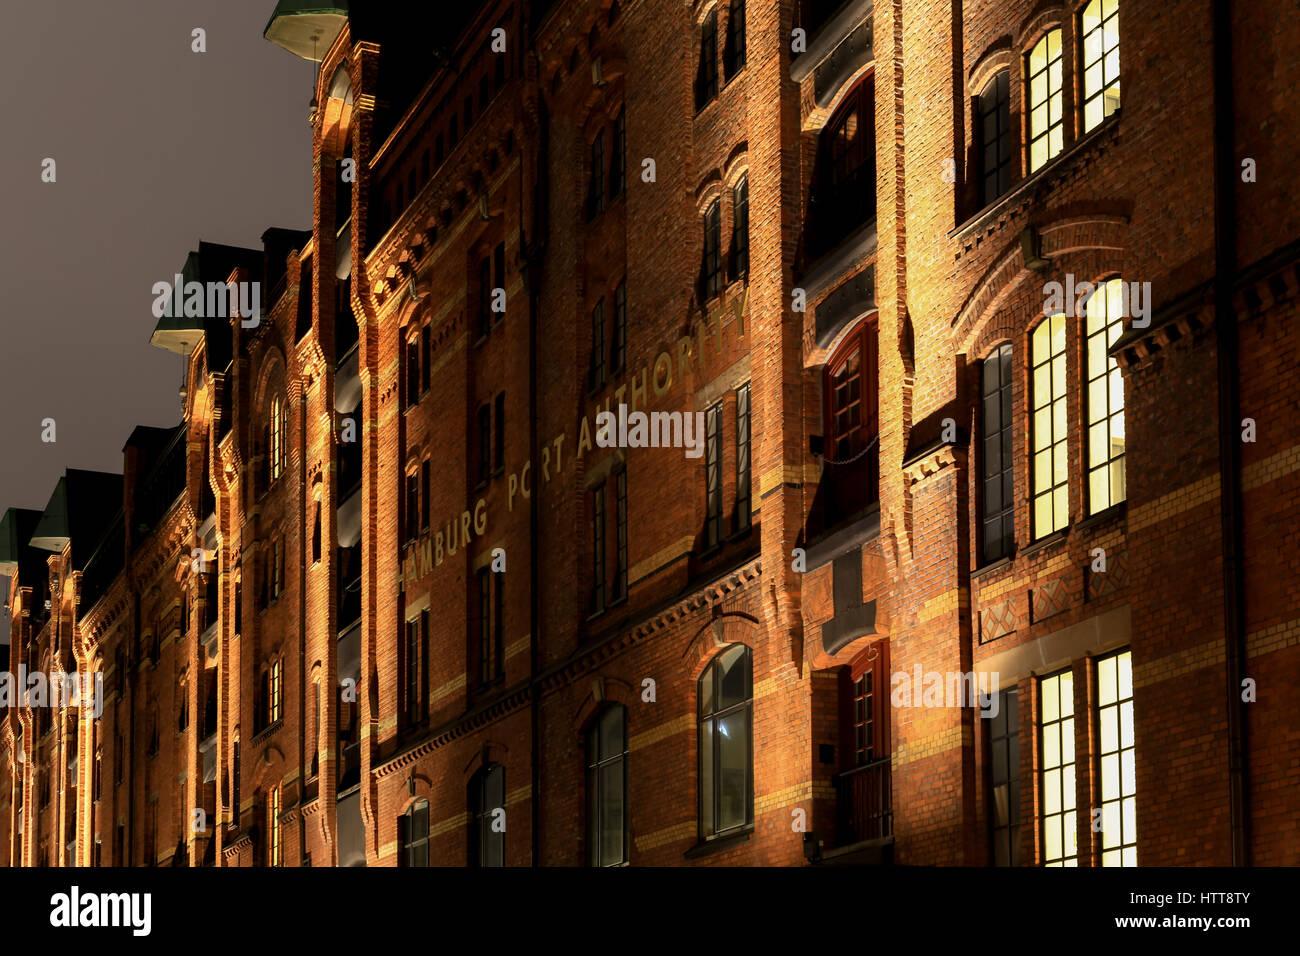 Hamburg Port Authority Stockfotos & Hamburg Port Authority Bilder ...